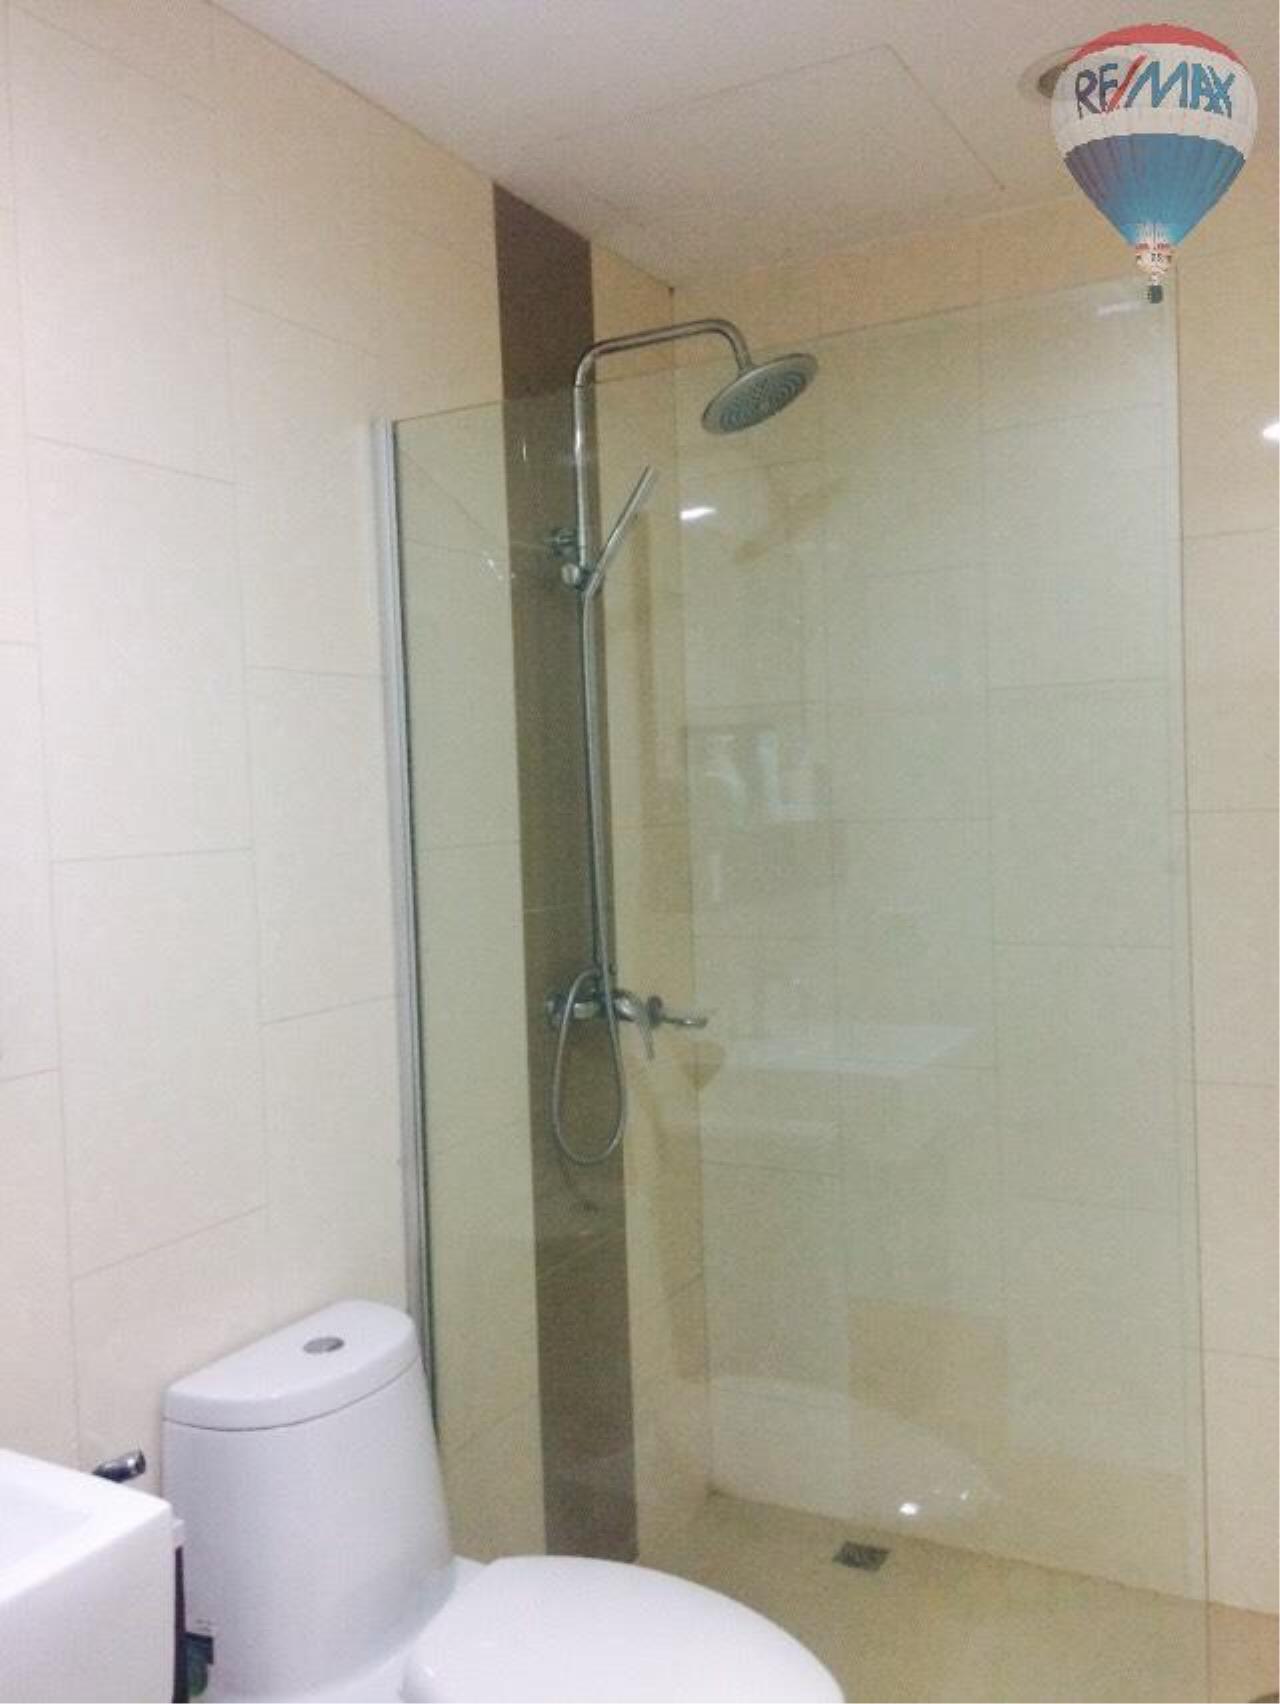 RE/MAX Properties Agency's Condominium for rent 2 bedrooms 92 Sq.m. at Renova Residence 17